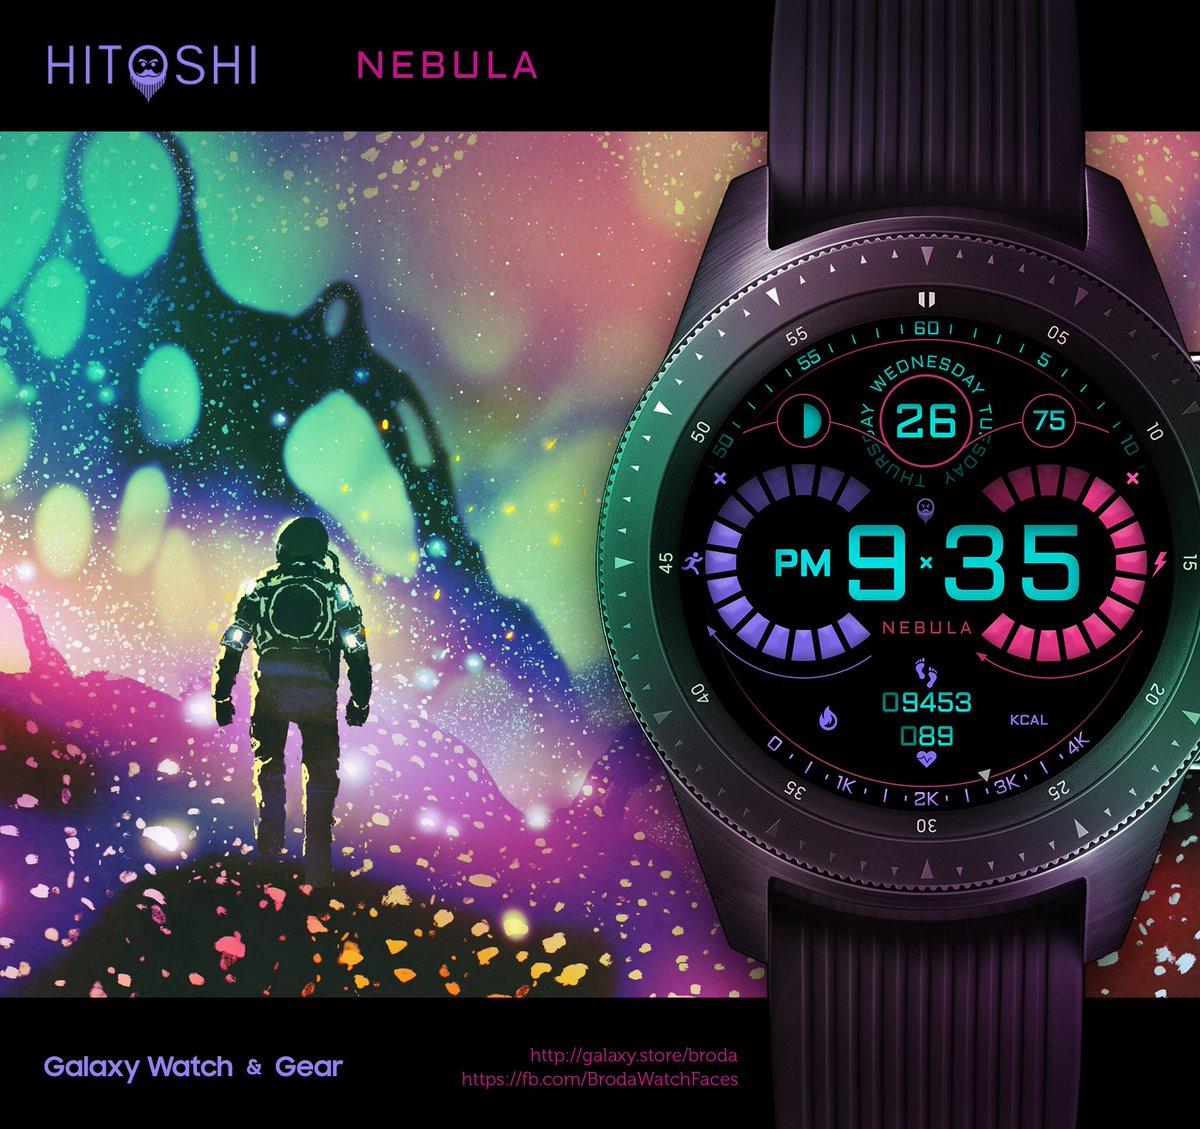 Hitoshi Nebula is now available ⌚🙂 https://galaxy store/hnebula